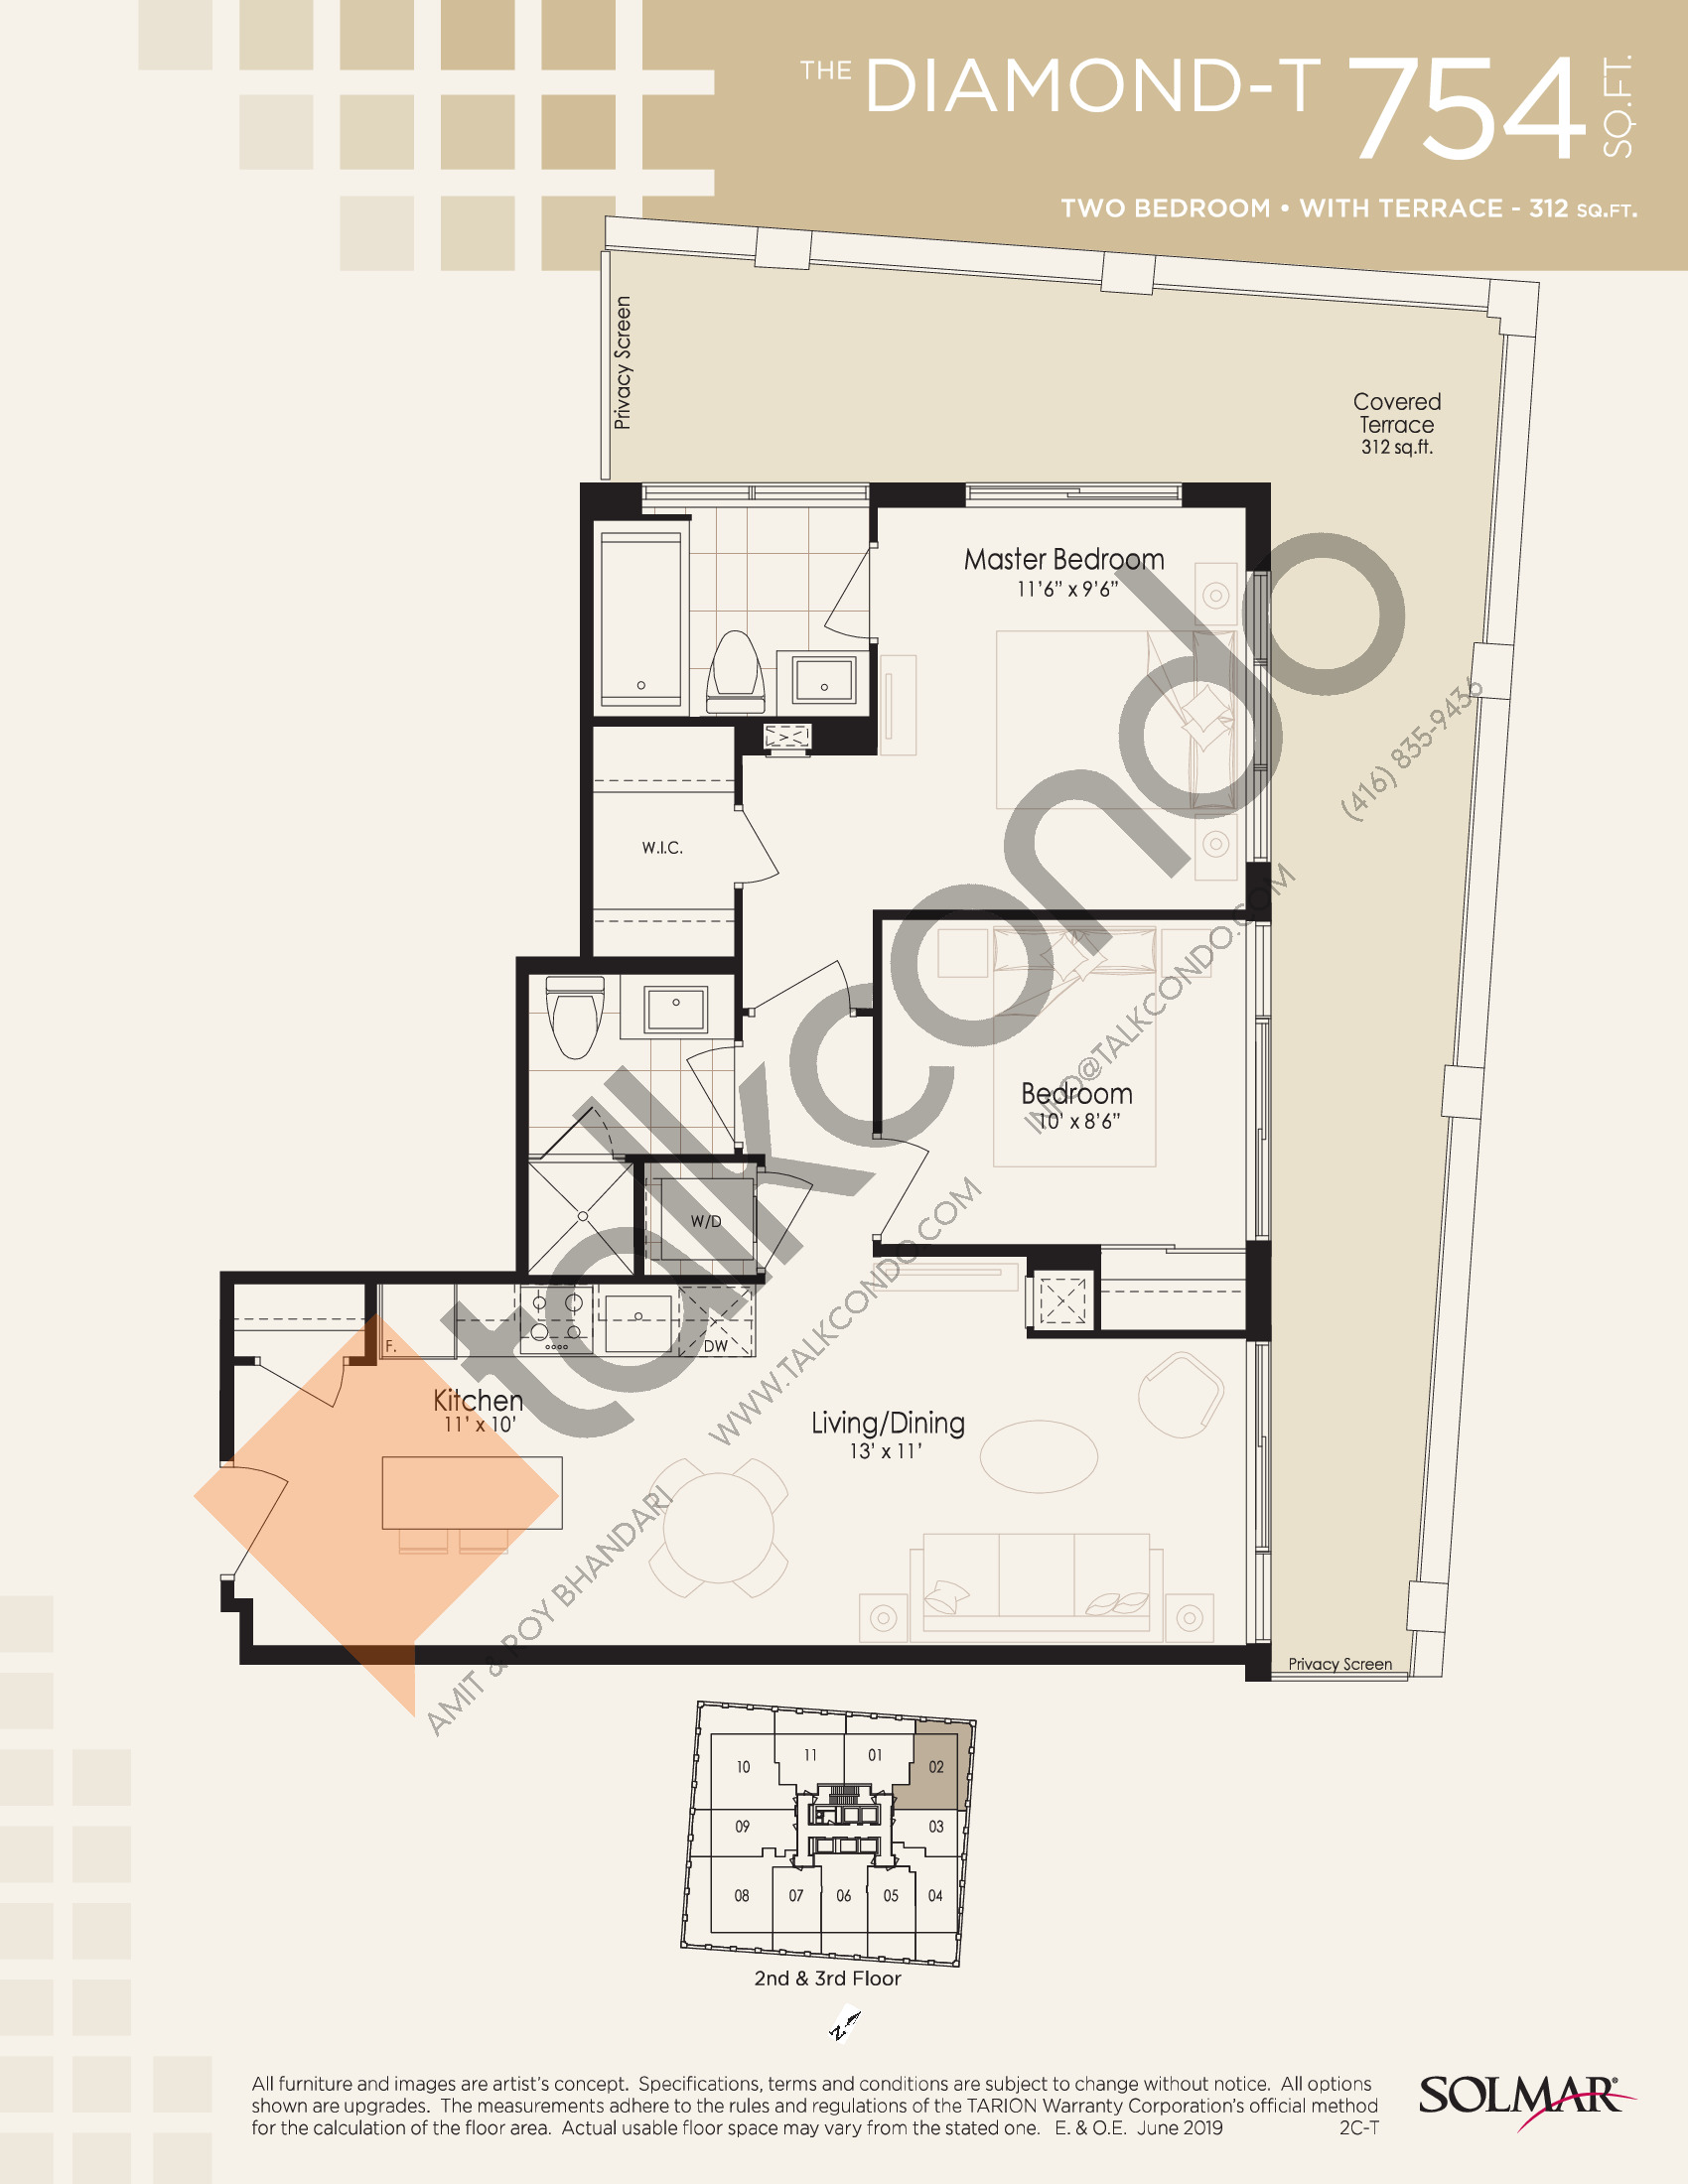 The Diamond-T Floor Plan at Edge Tower 2 Condos - 754 sq.ft